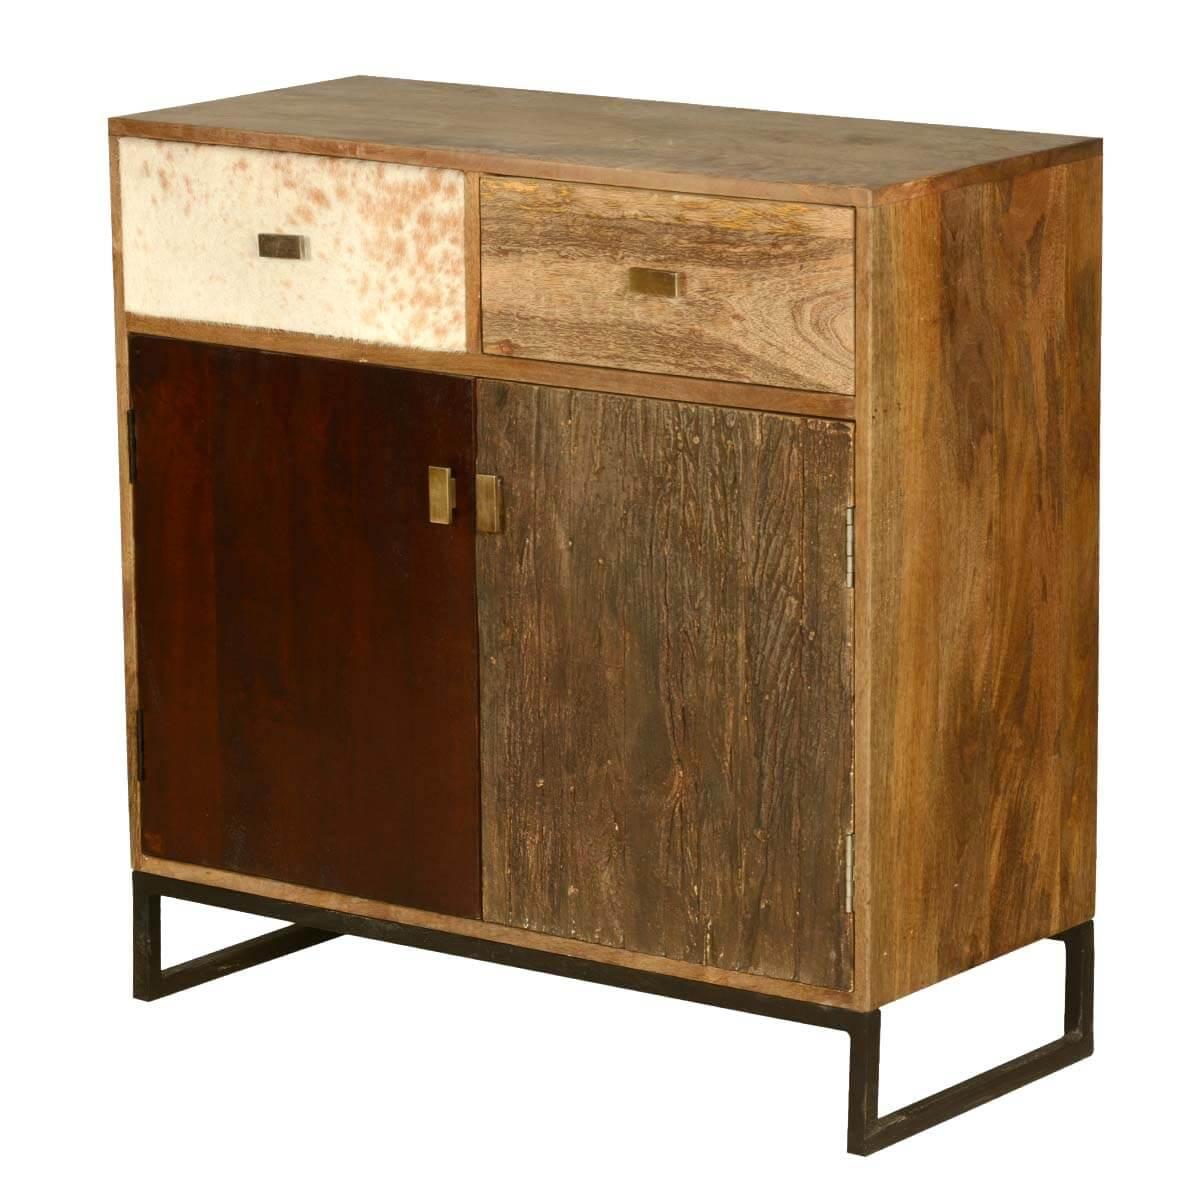 60's Retro Mango Wood Free Standing 2 Drawer Kitchen Buffet Cabinet